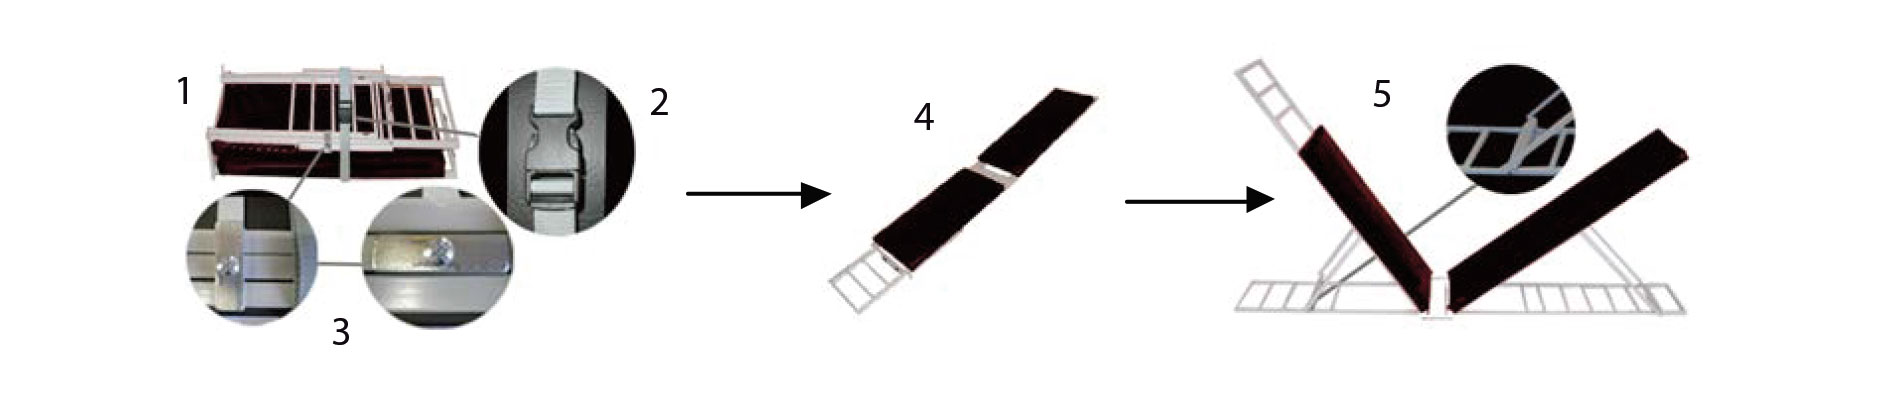 5-etapes-montage